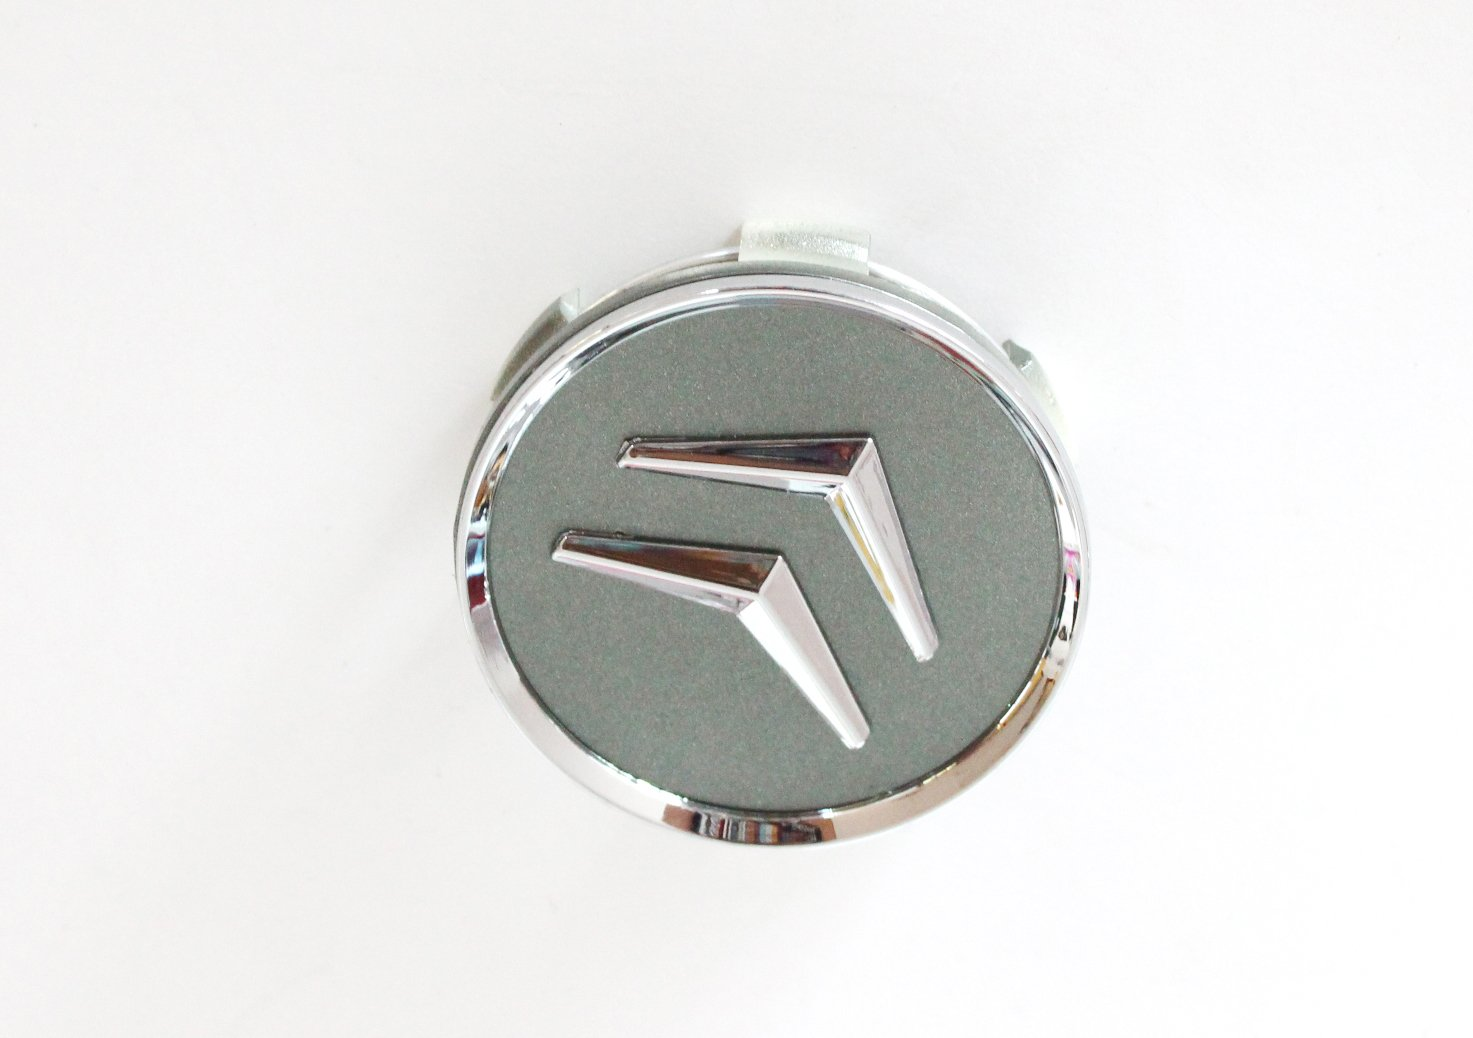 Amazon.com: Martillo Citroen 60 mm. gris rueda centro ...